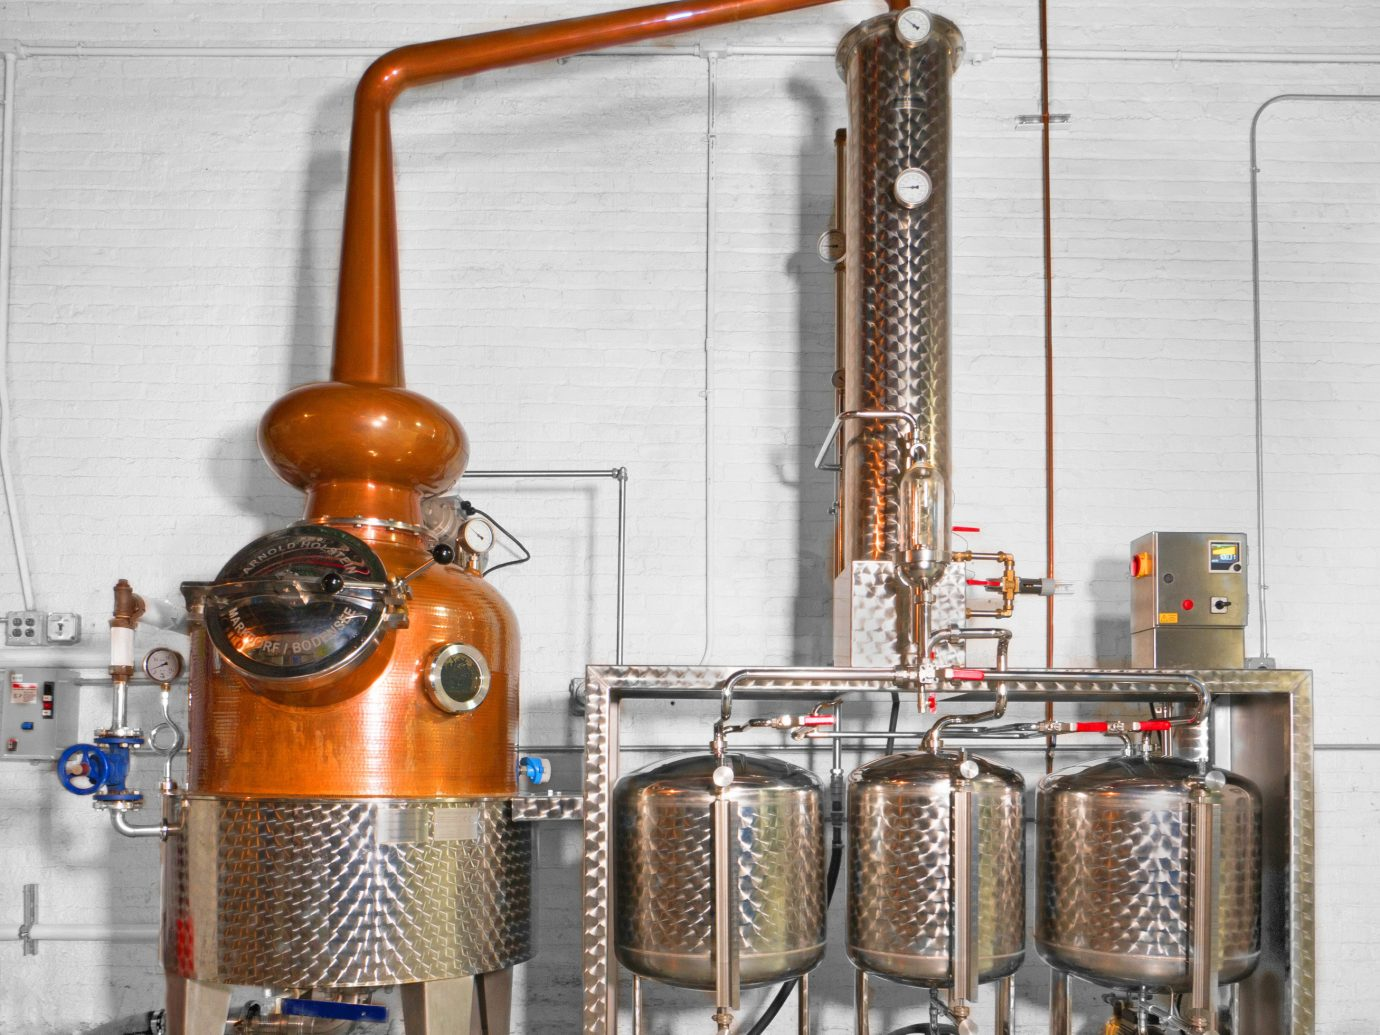 Brooklyn Food + Drink product machine brewery